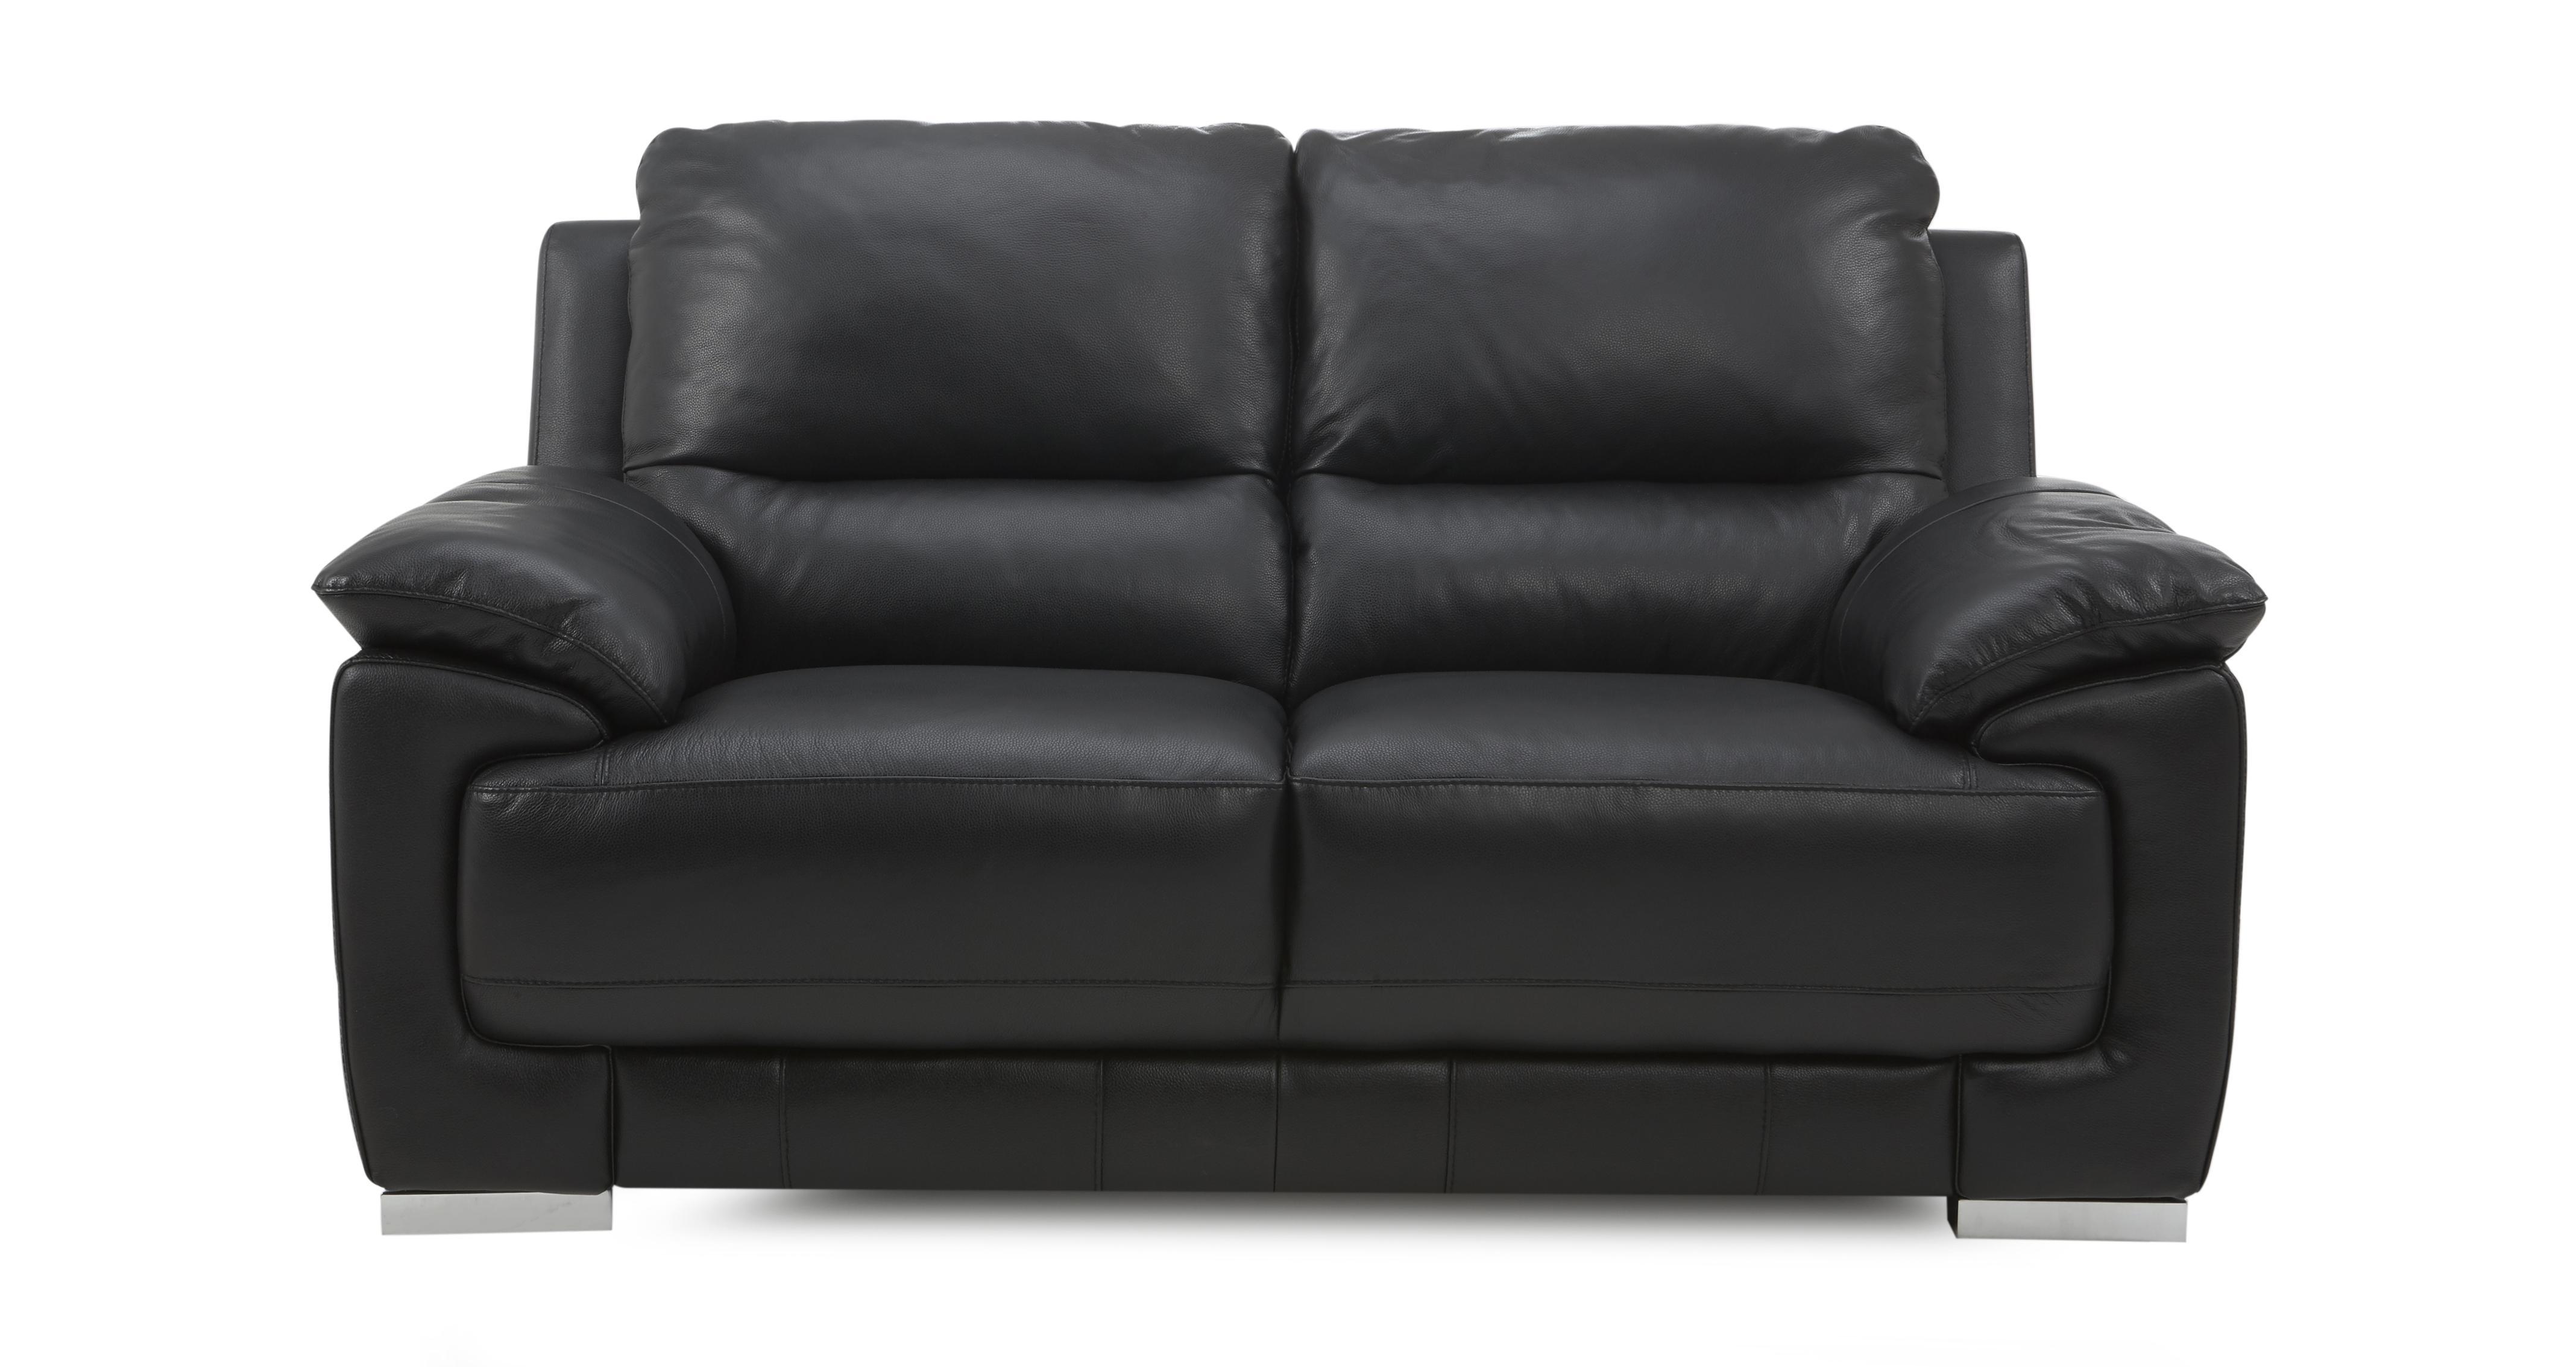 Falcon 2 Seater Sofa New Club | DFS